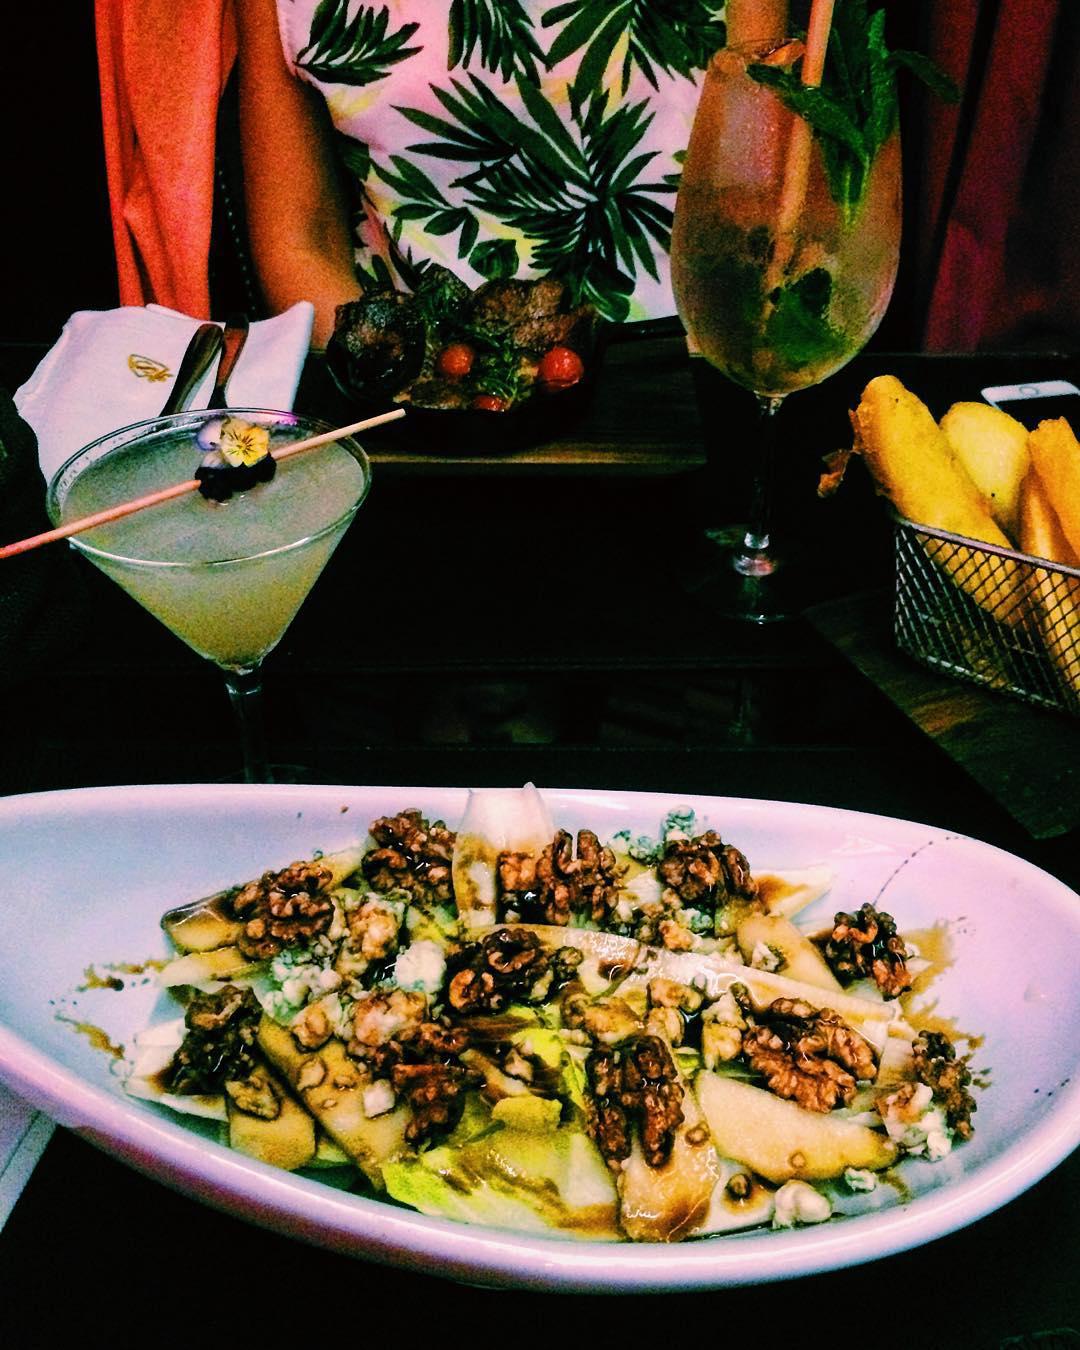 Veggie dinner @singapurbar